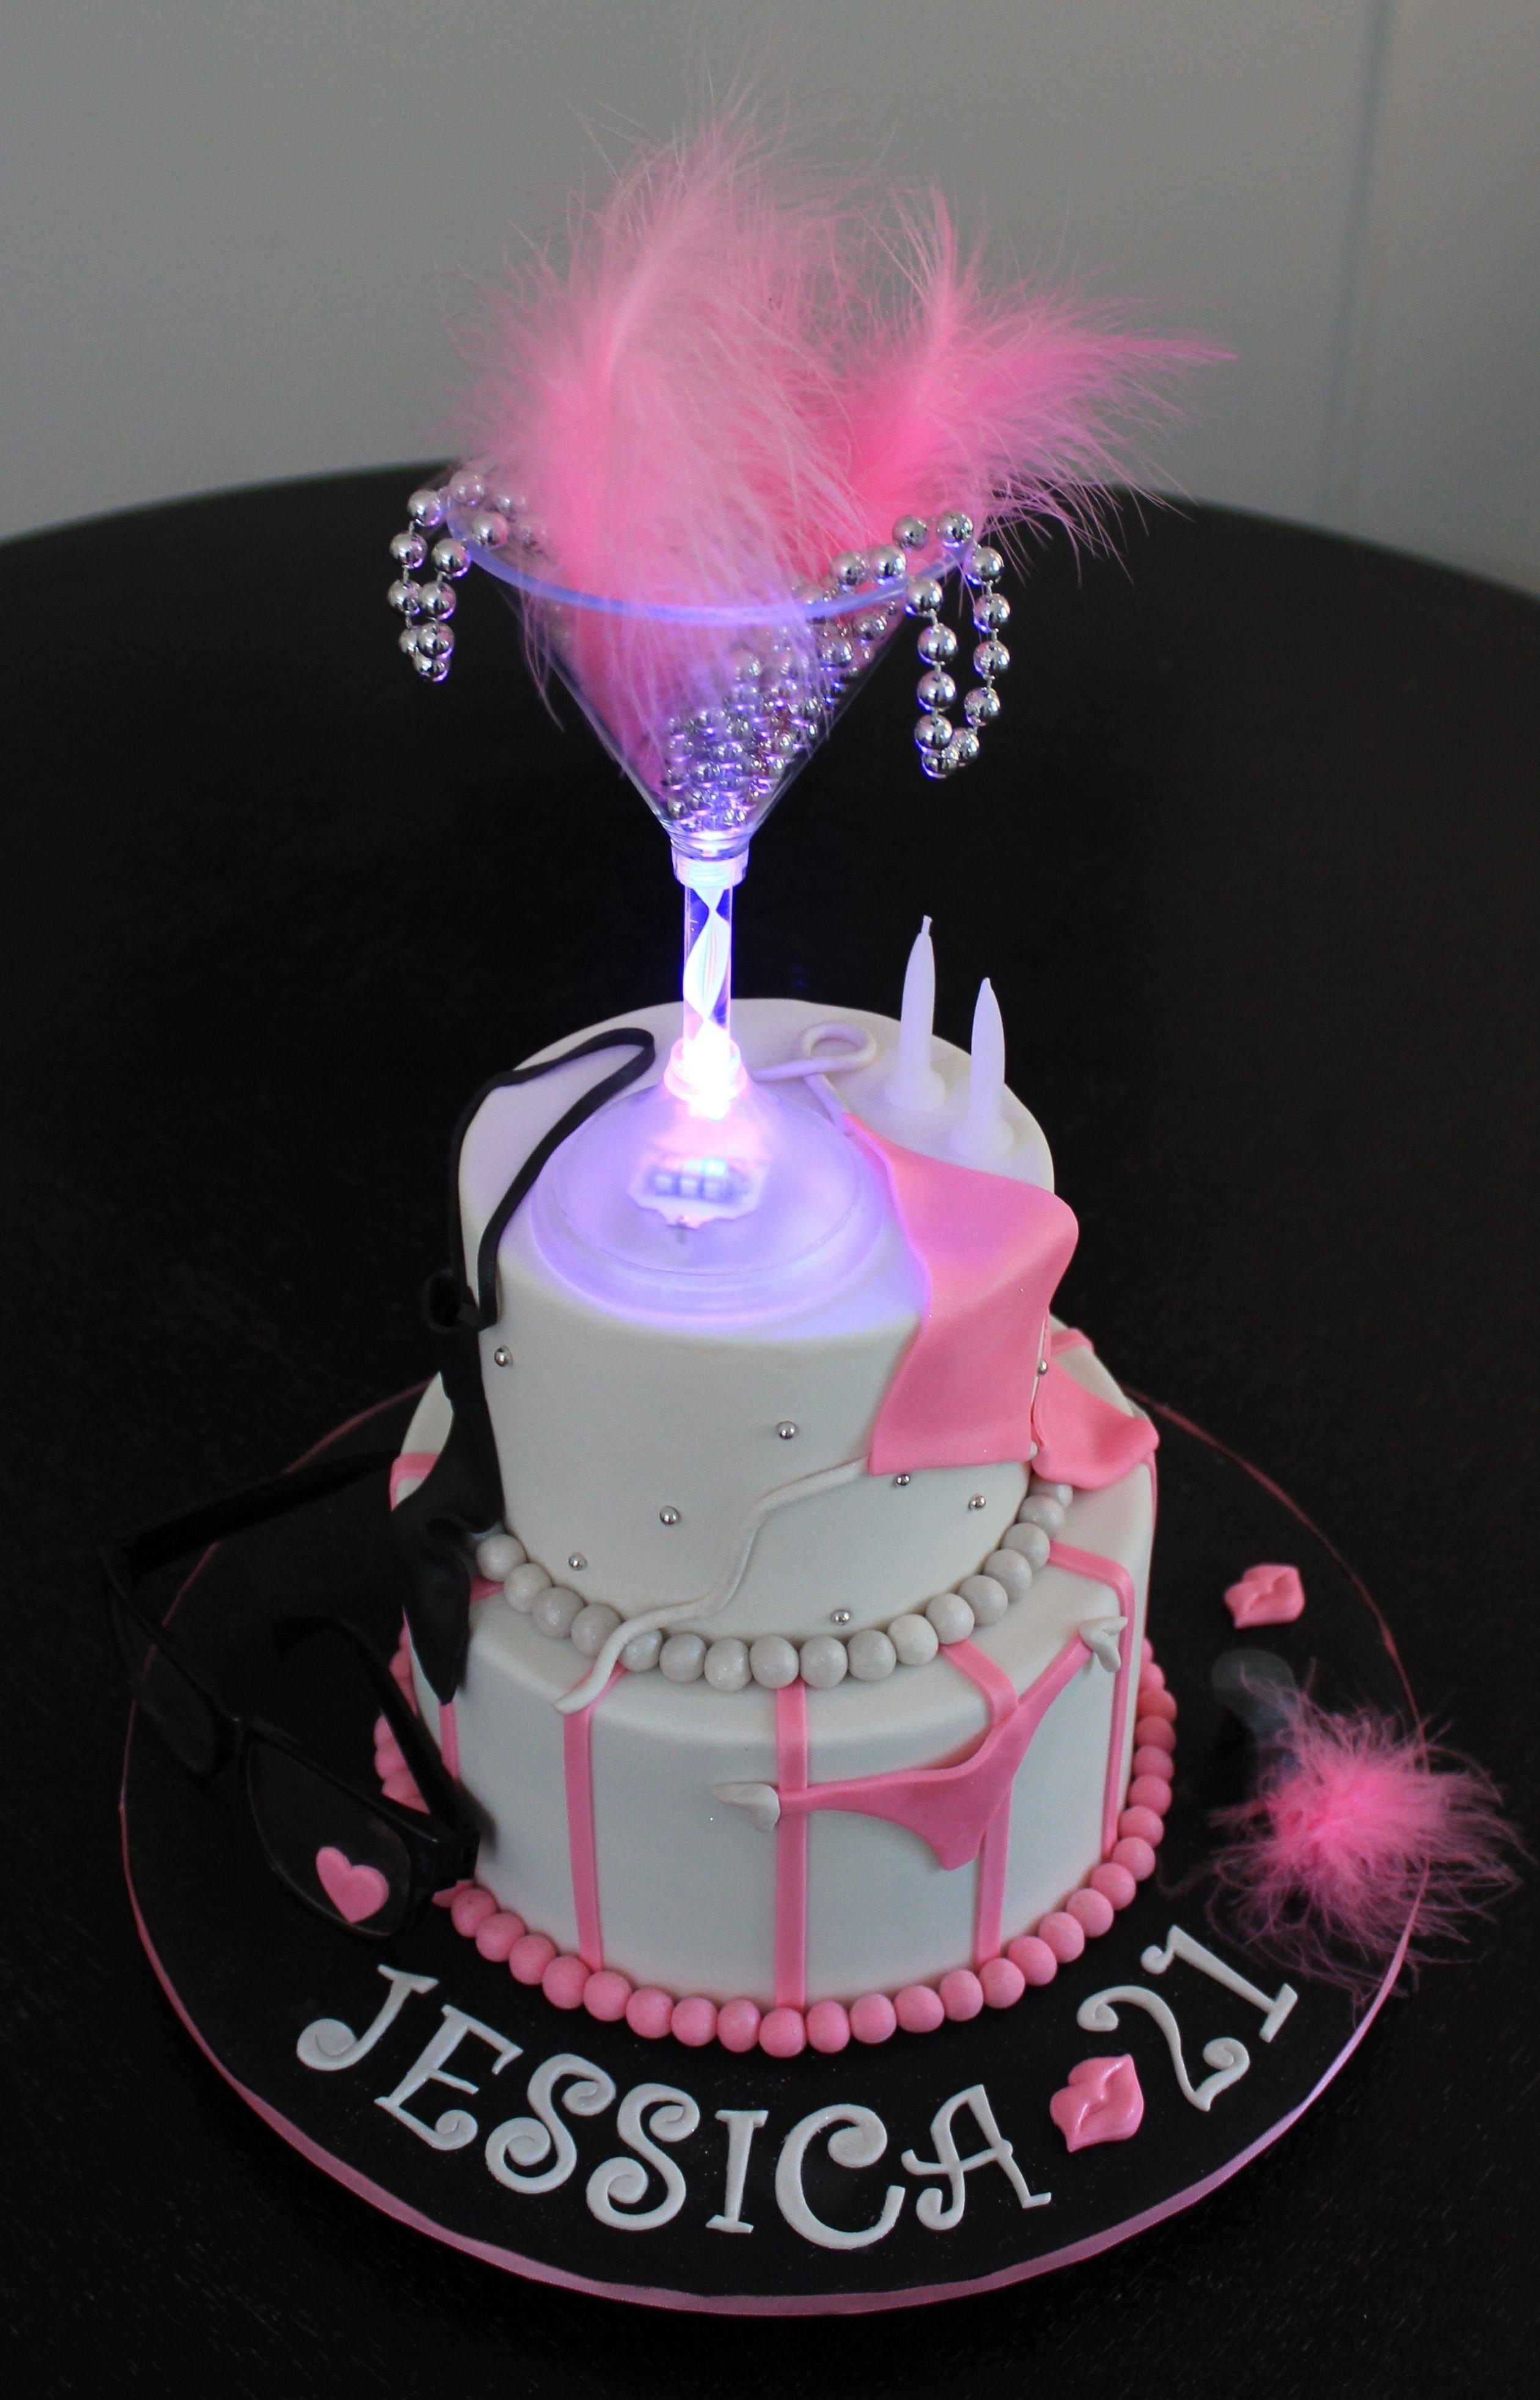 10 Spectacular 21St Birthday Ideas For Girls 21 birthday cake ideas for girls 646 21 birthday cake ideas for 1 2021